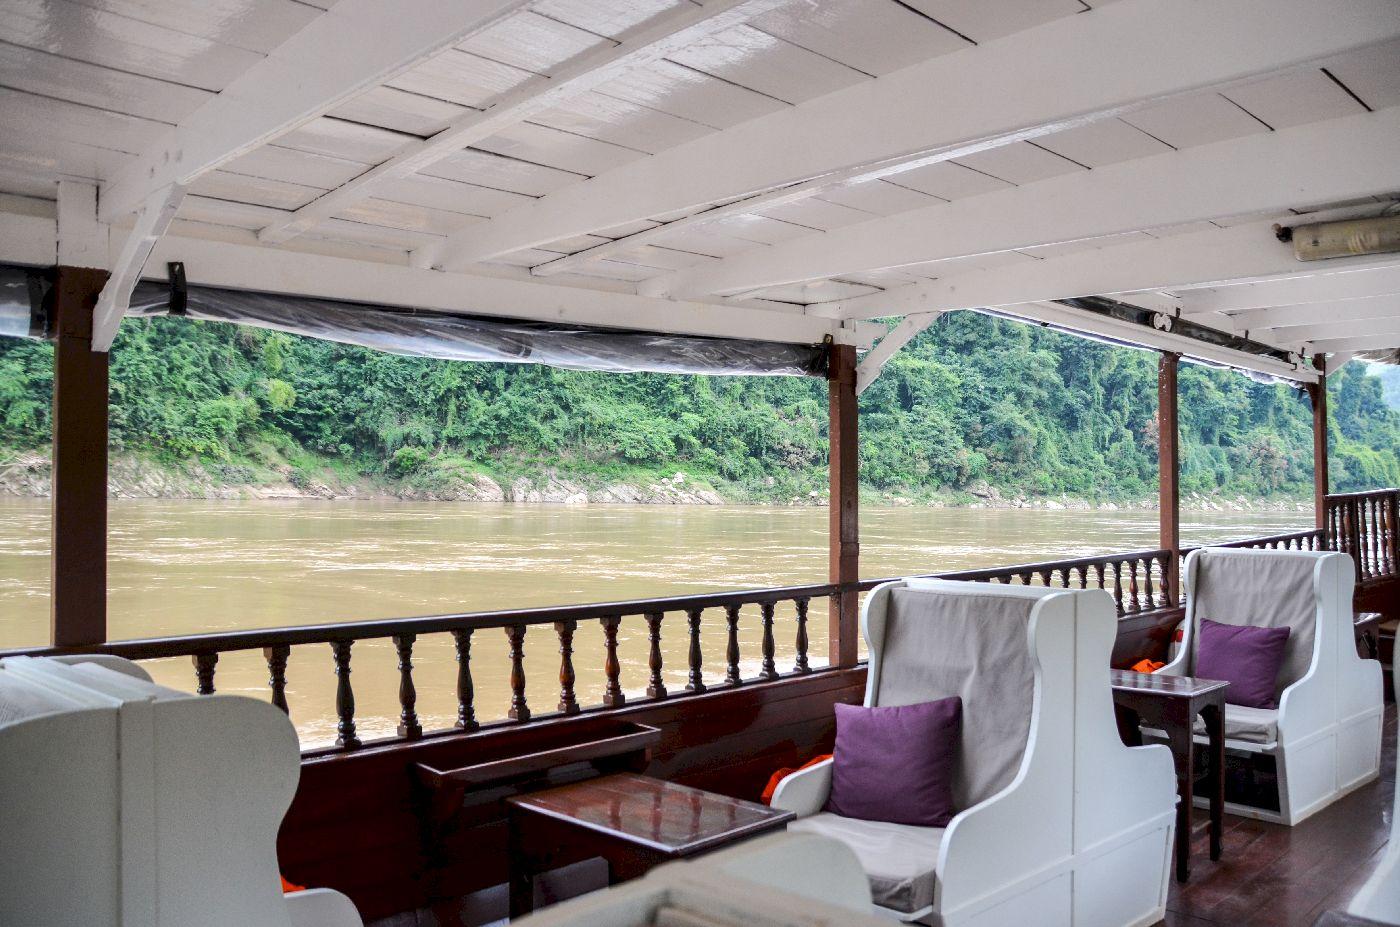 https://blogvoyages.fr/wp-content/uploads/2018/01/Mekong-laos-0179.jpg